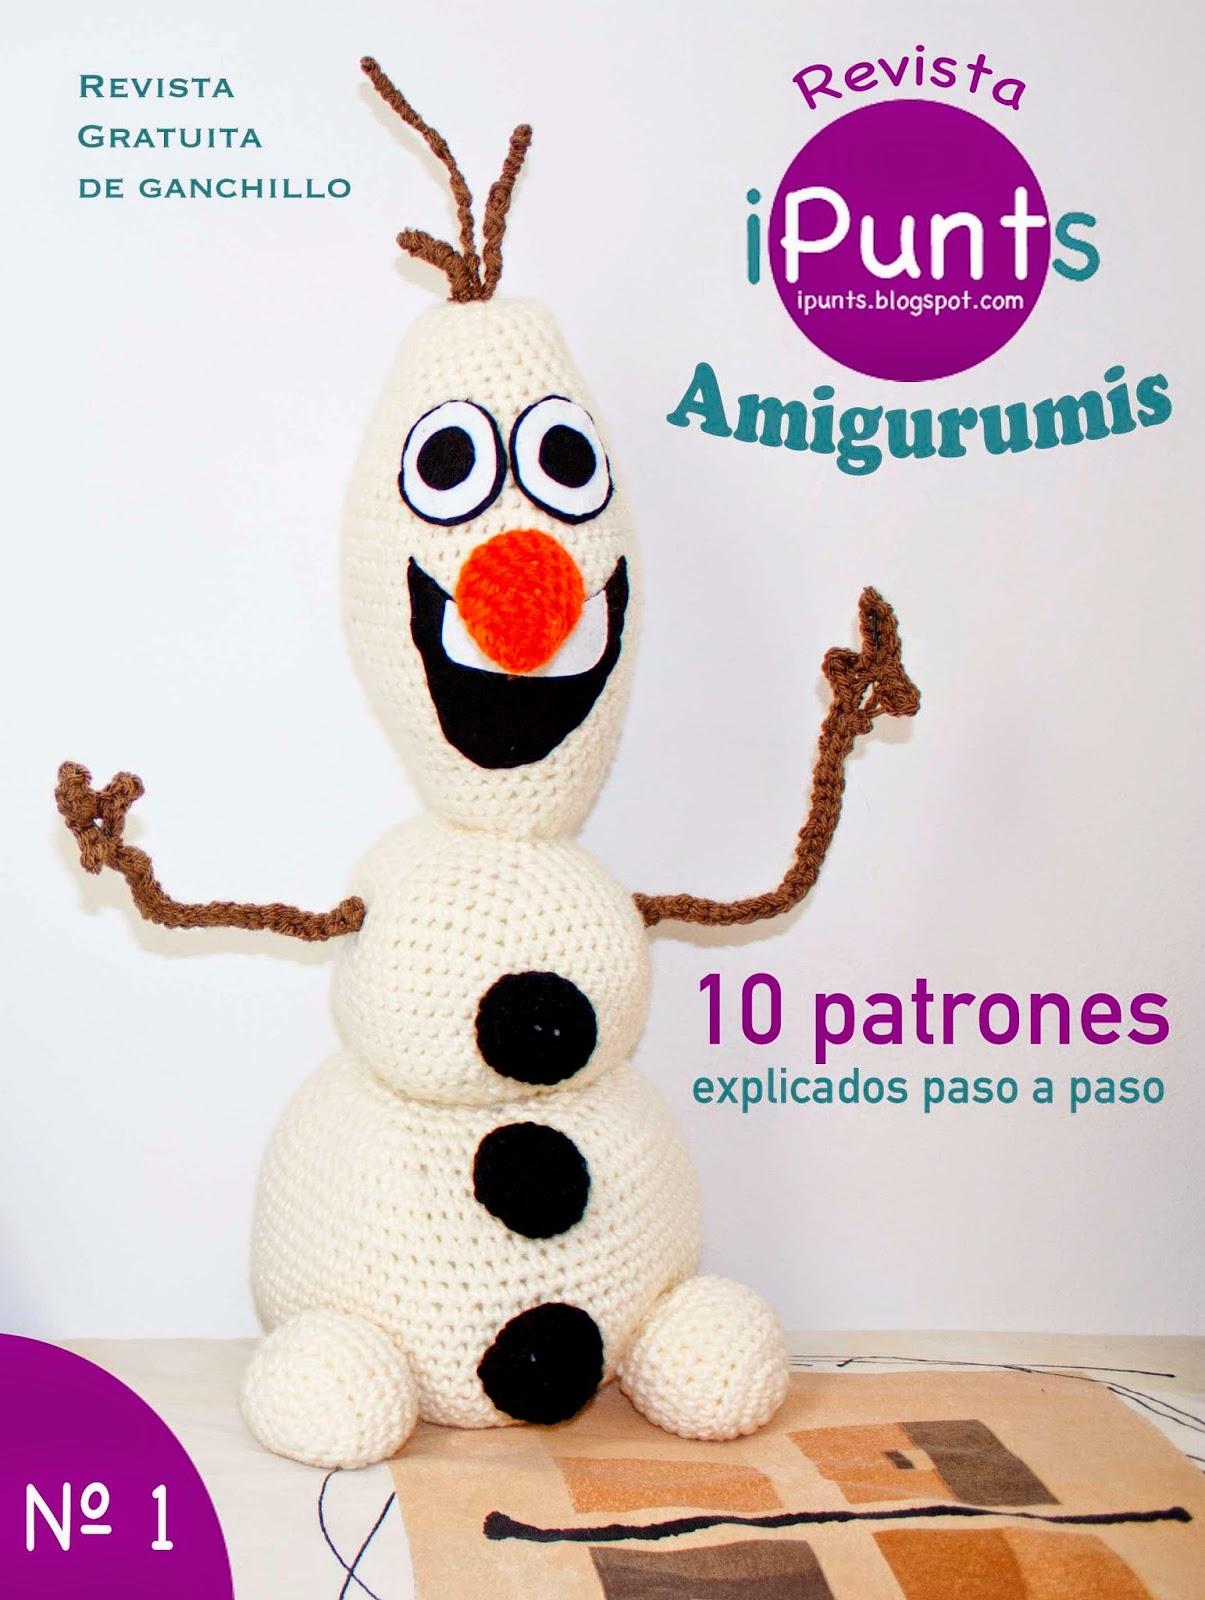 revista ipunts gratis patrones ganchillo crochet amigurumis